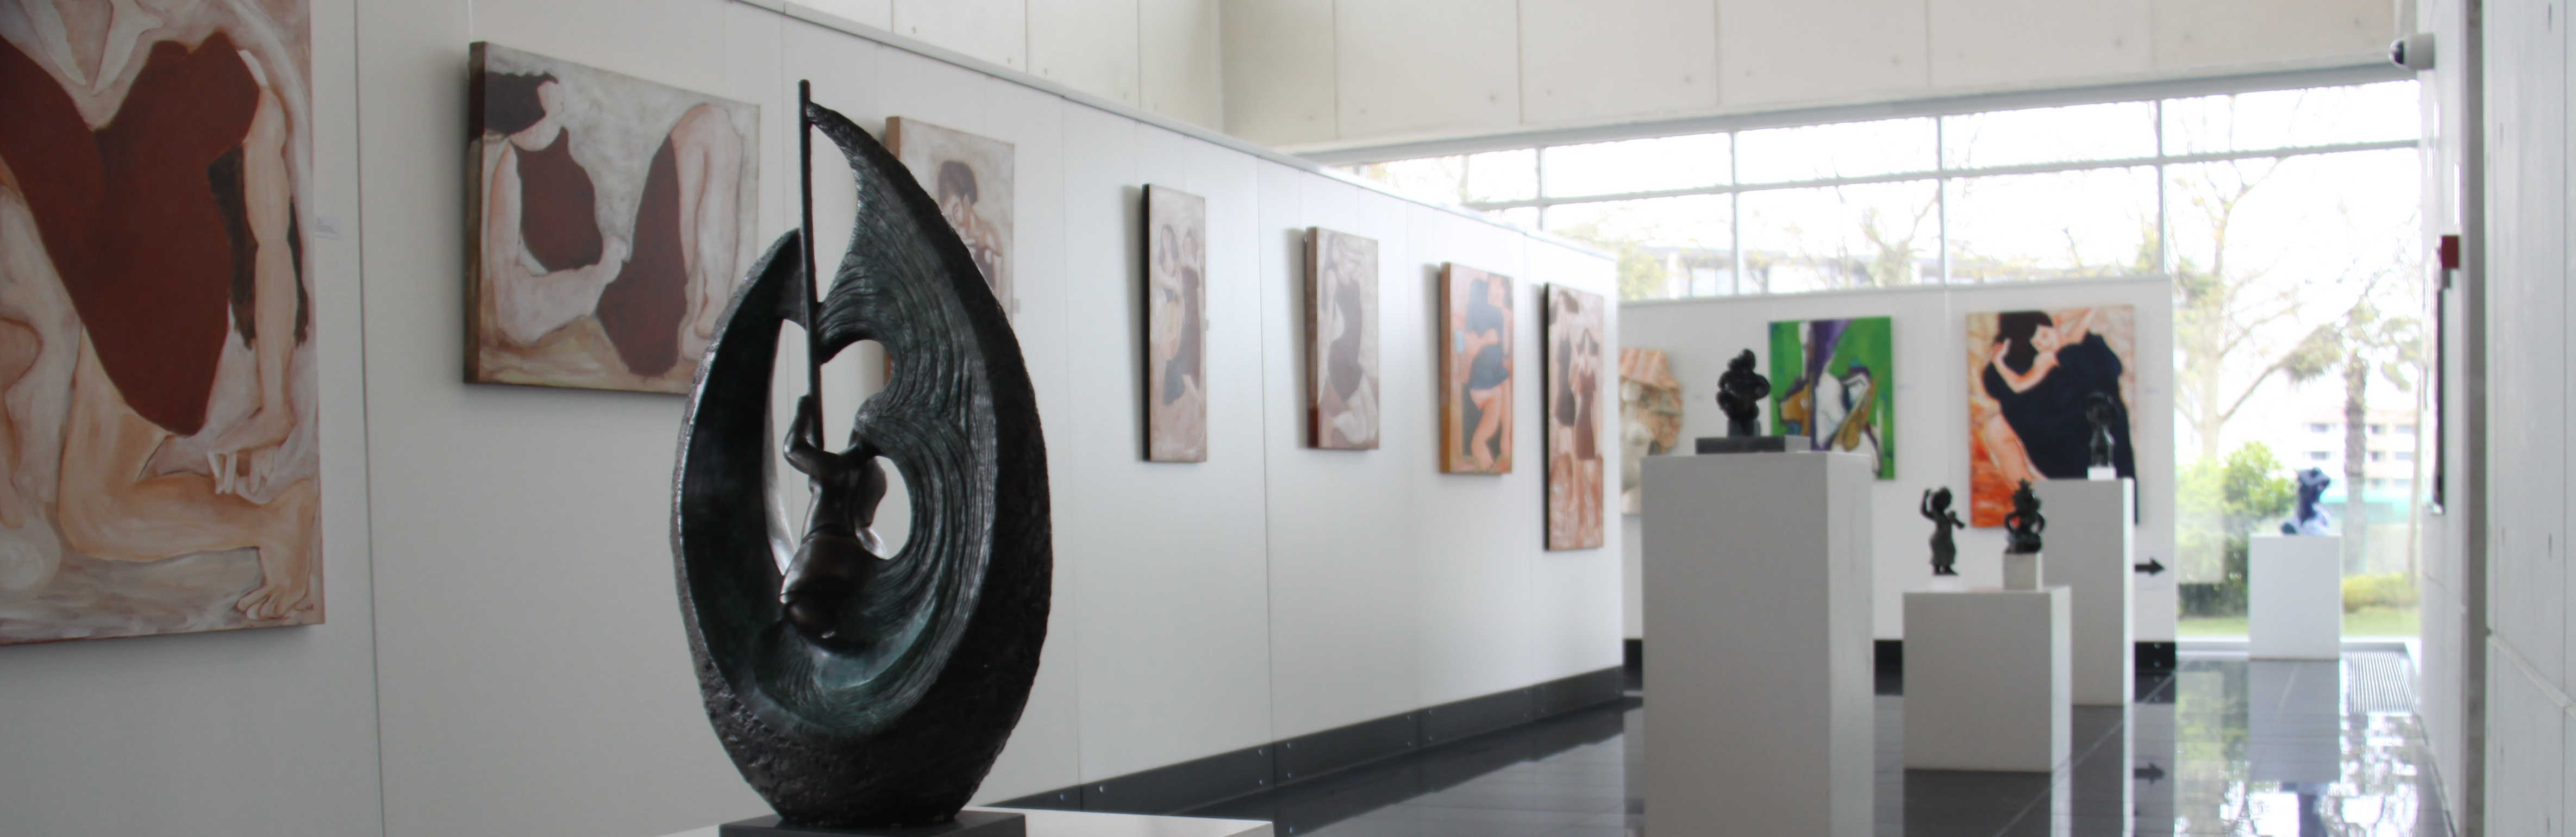 Galeria de exposições da DGAJ